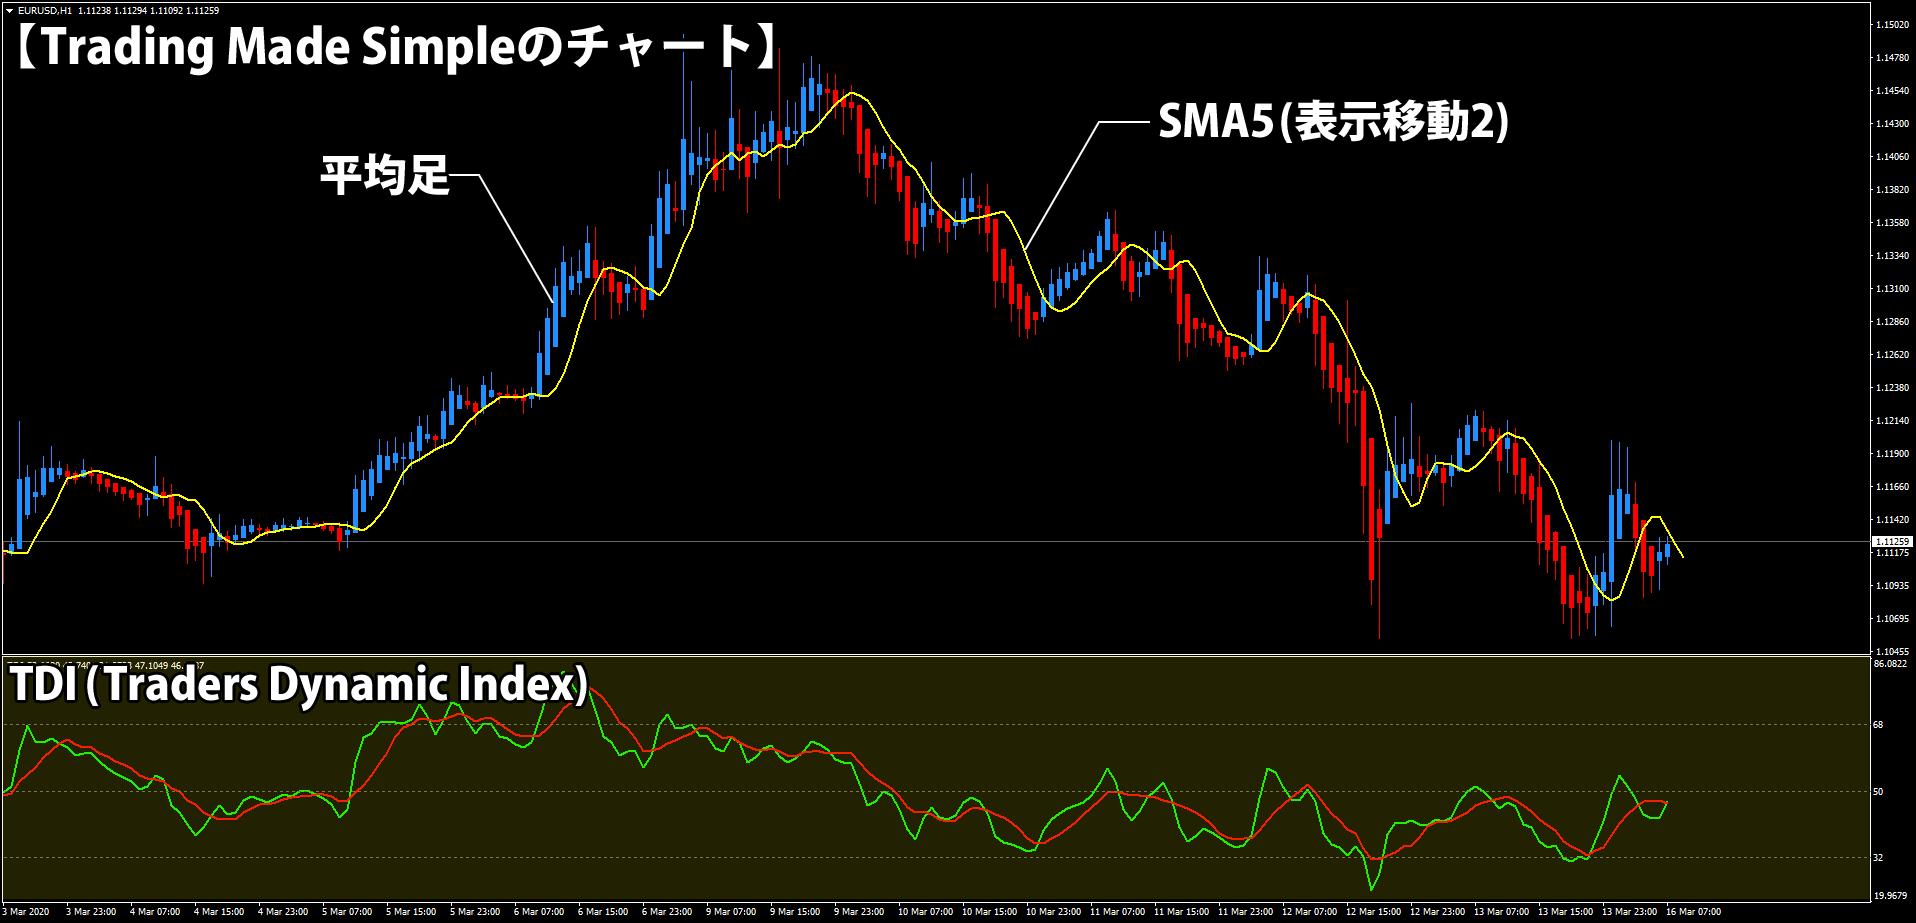 Trading Made Simpleのチャート画像(ユーロドル4時間足)